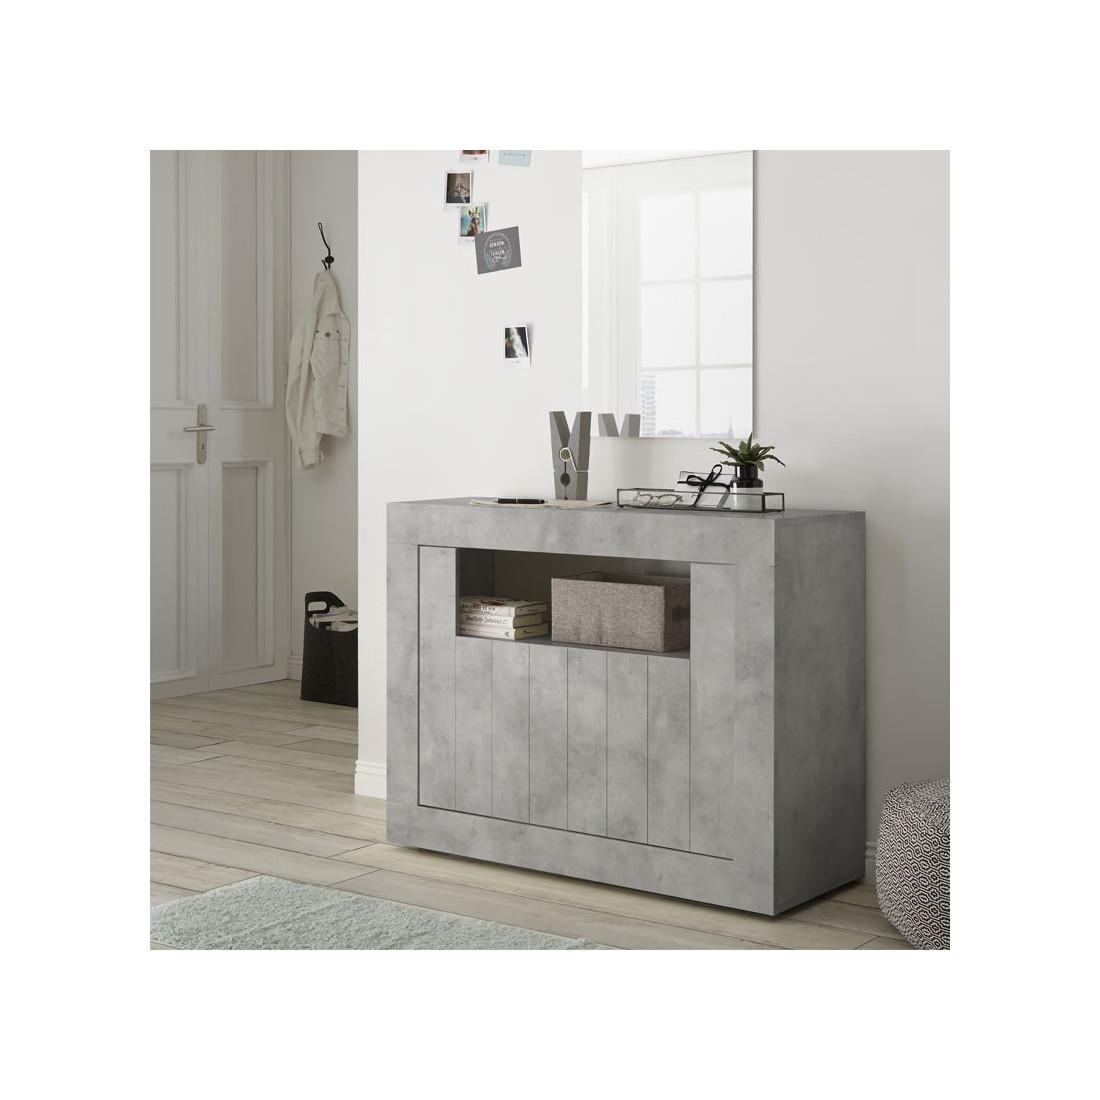 salle manger compl te b ton cir clair lubio n 1 salle manger. Black Bedroom Furniture Sets. Home Design Ideas